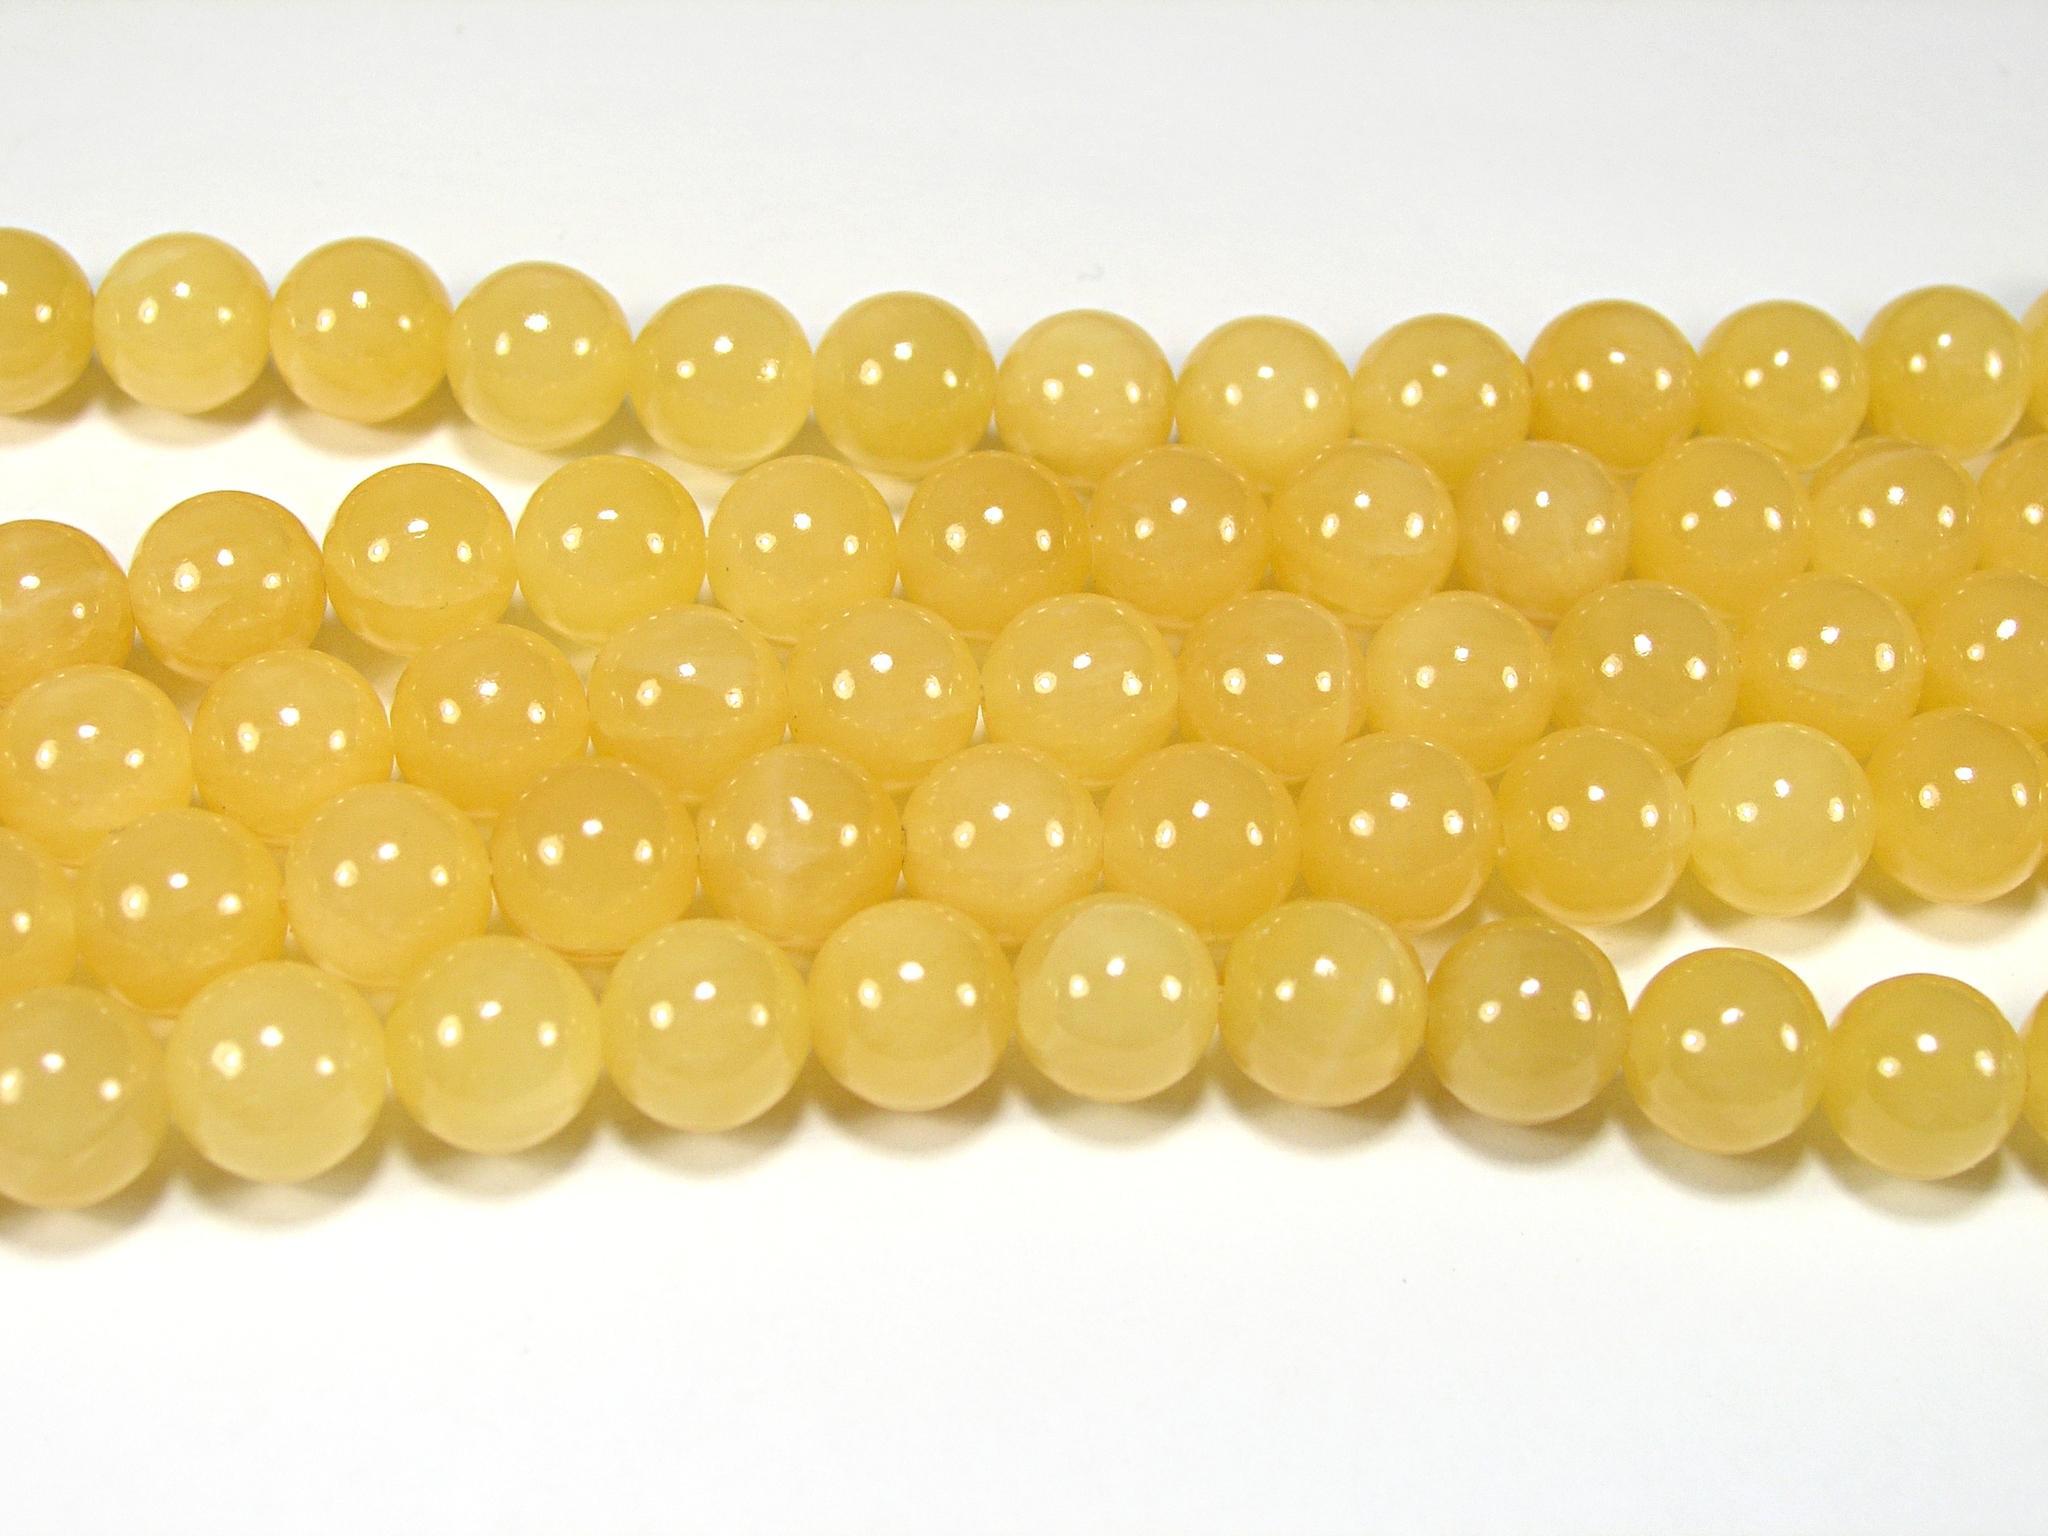 Нити бусин из жадеита медового, шар гладкий 10мм (оптом)